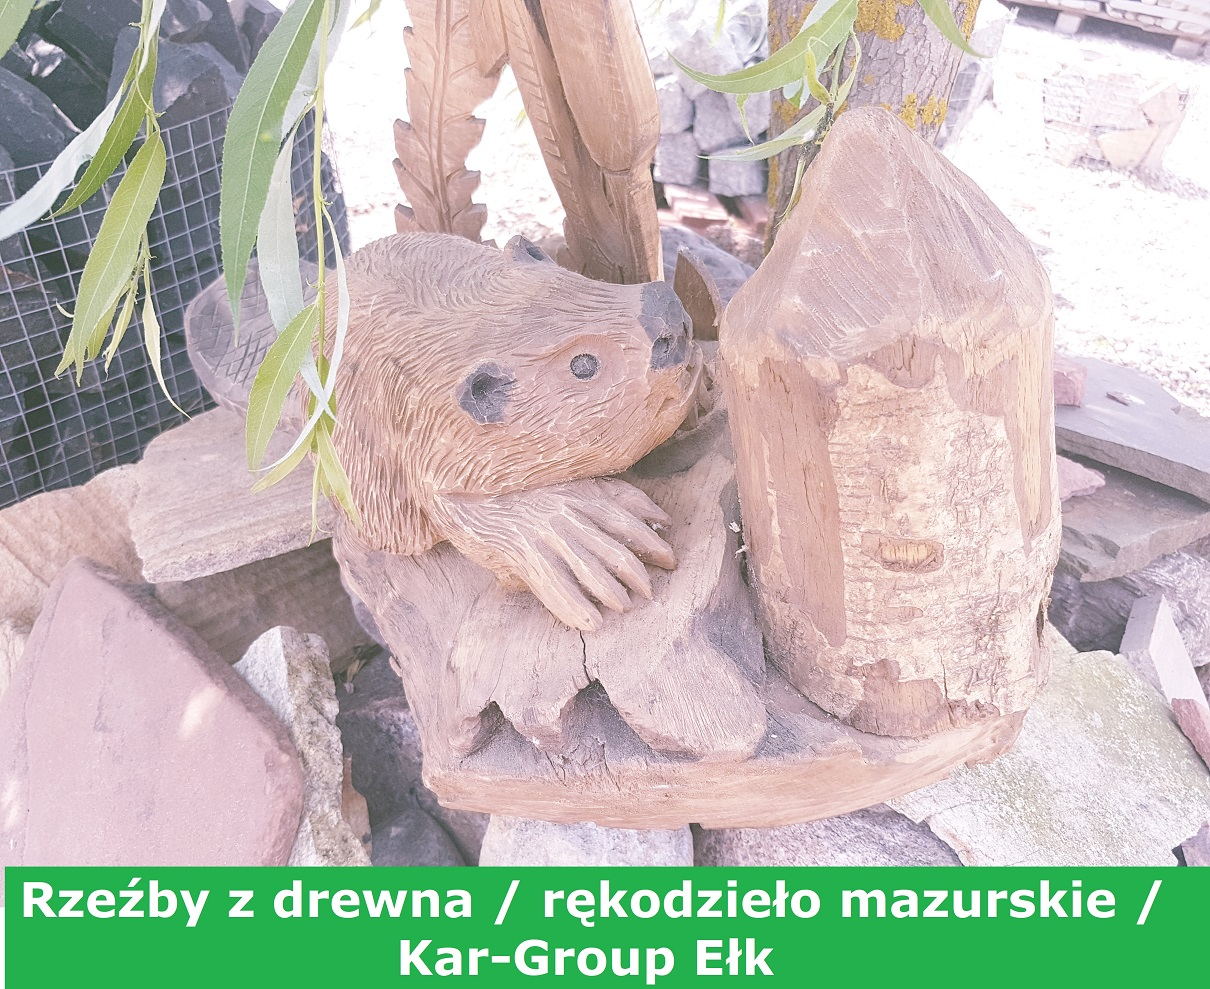 rzeźby ełk,rzeźby z drewna ełk,rękodzieło ełk,rzeźba w drewnie ełk,rzeźby drewniane ełk,rzeźby z drewna do ogrodu,rzeźby z drewna do domu ełk